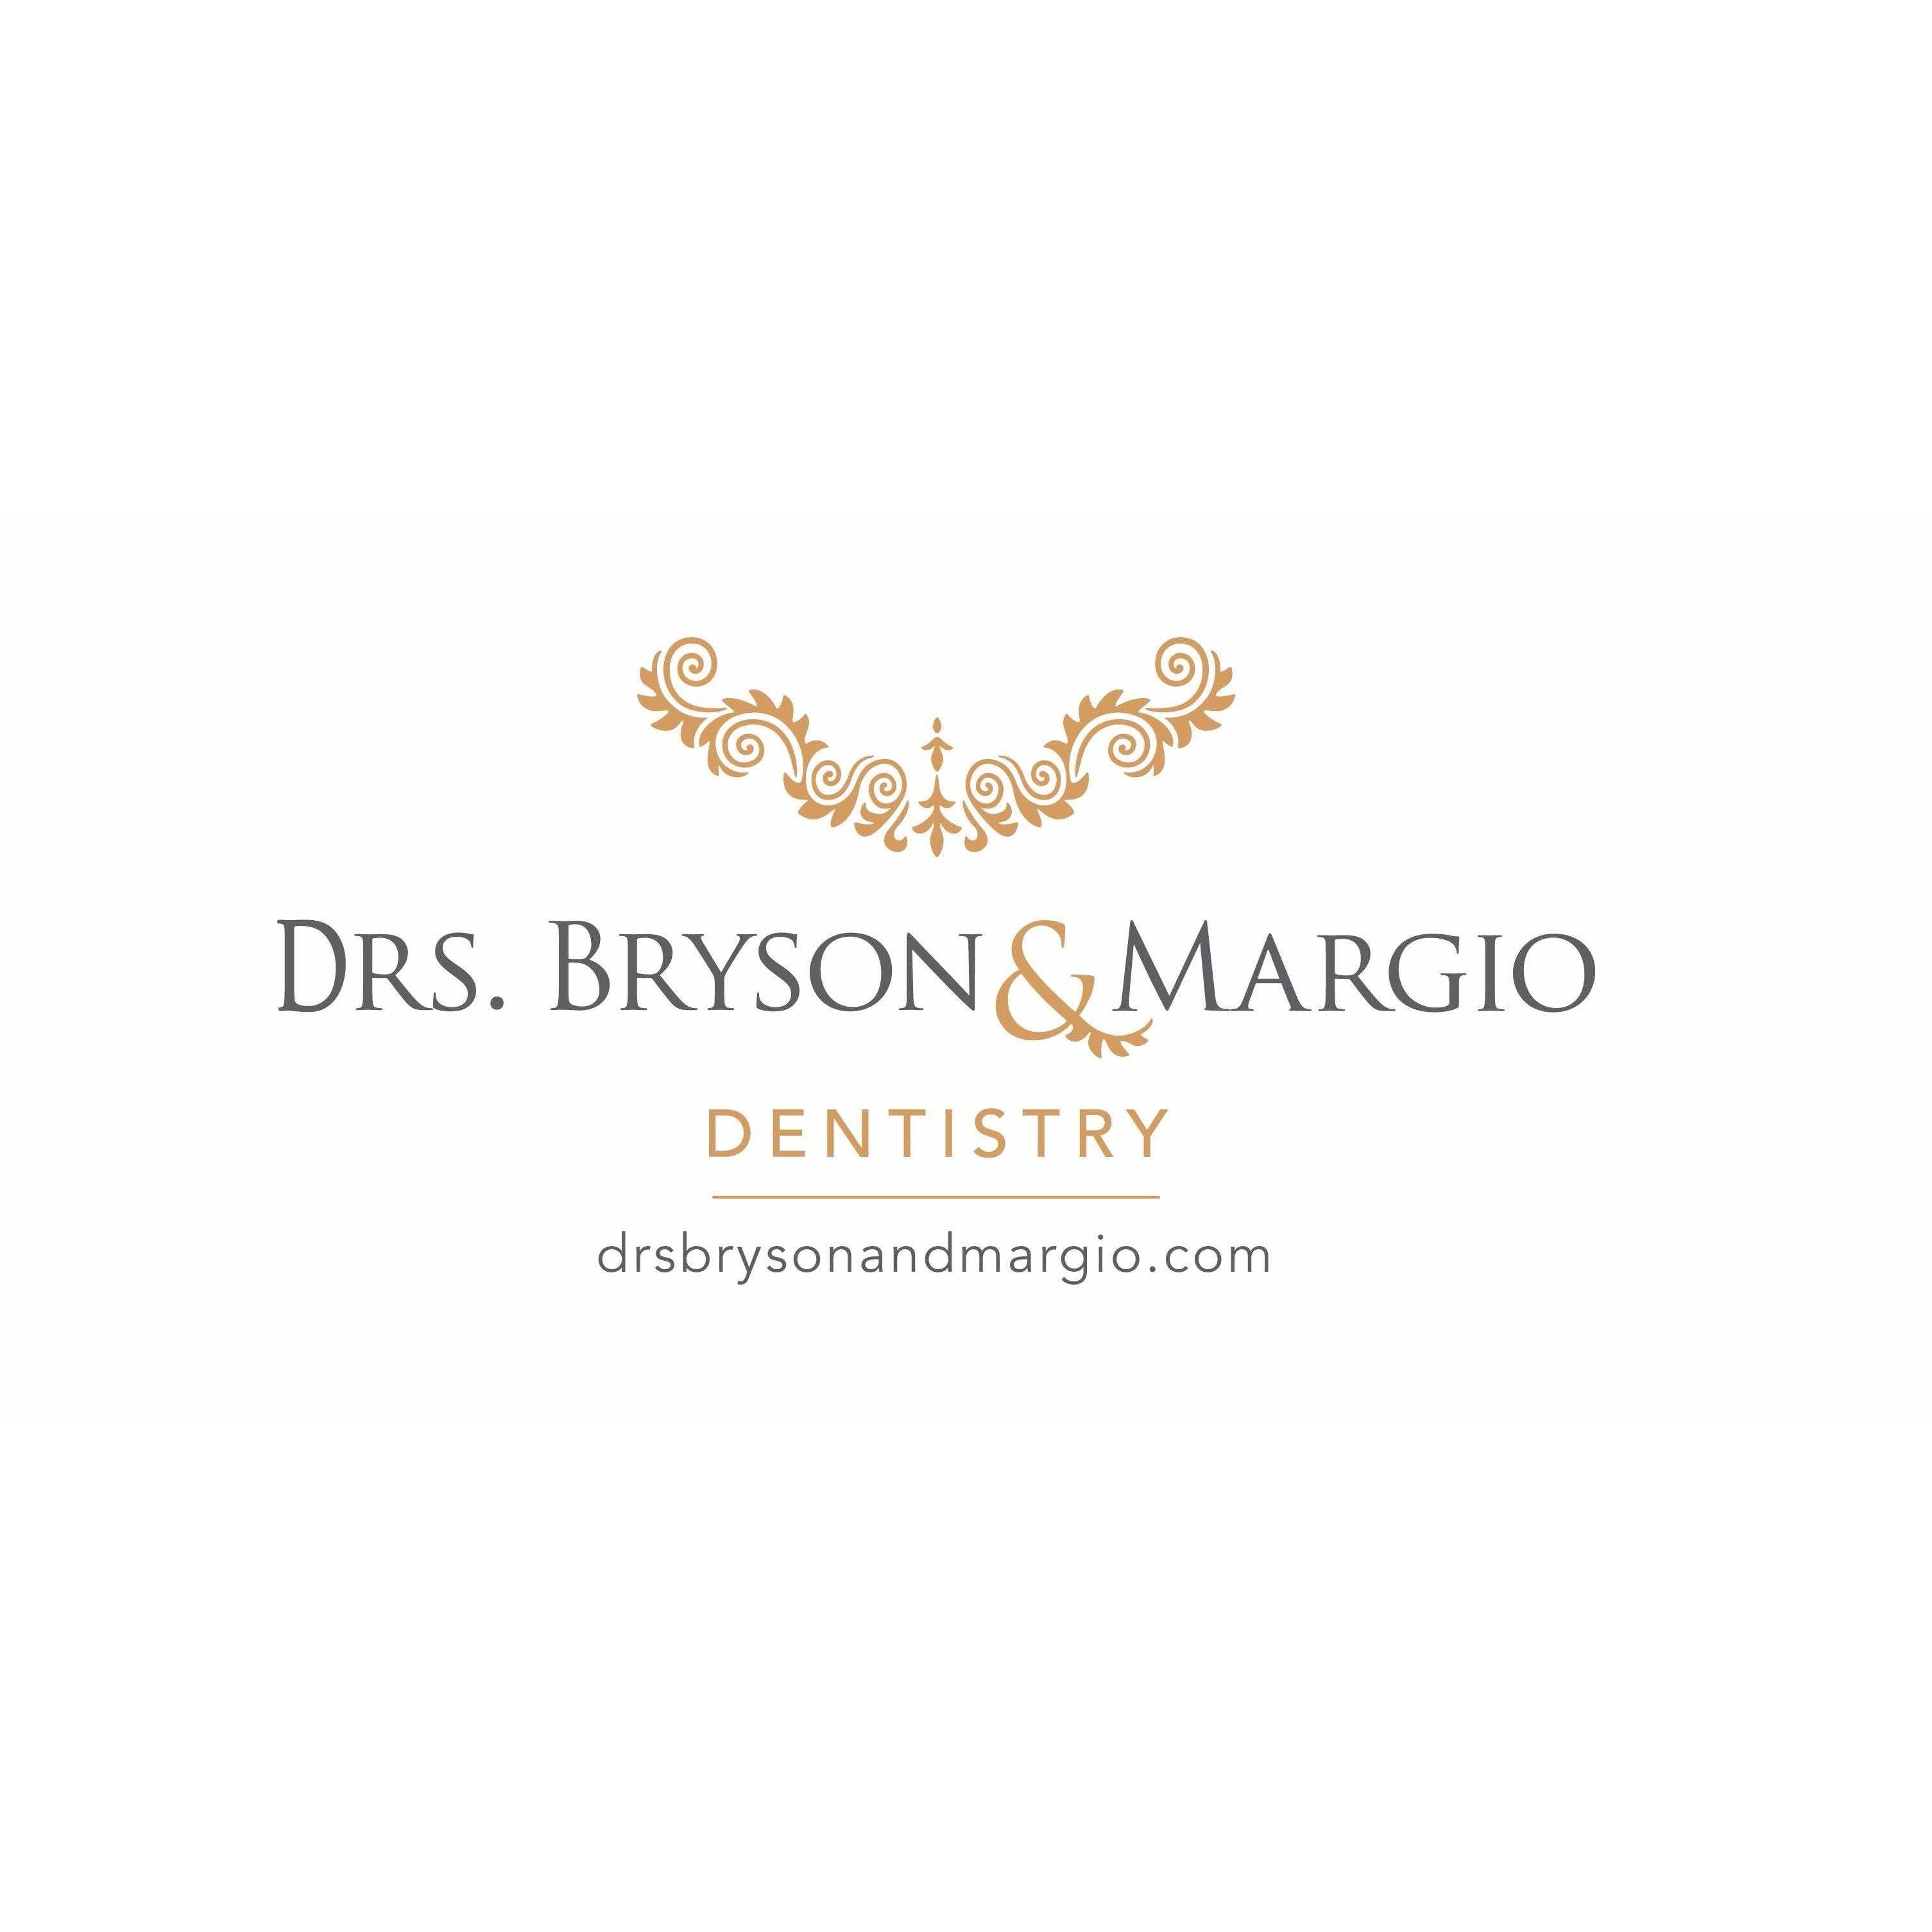 Drs. Bryson & Margio Dentistry